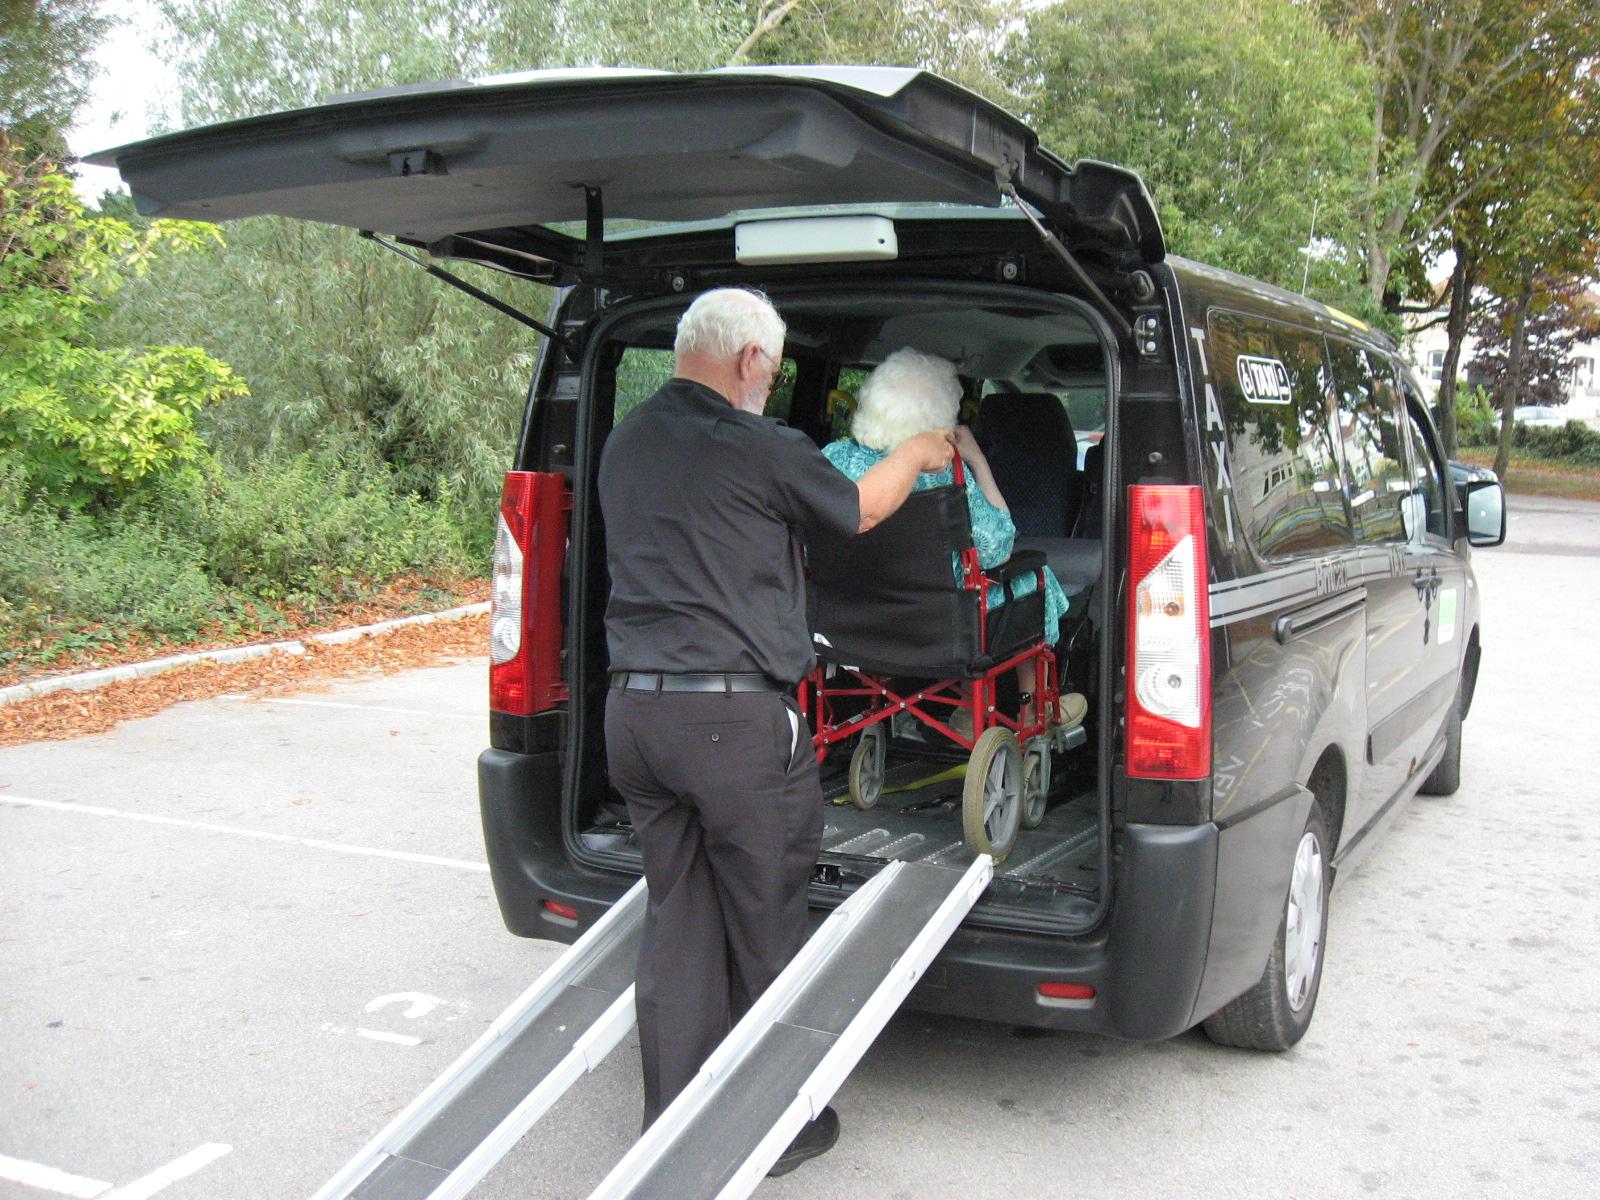 cig bins and wheelchair pics 027